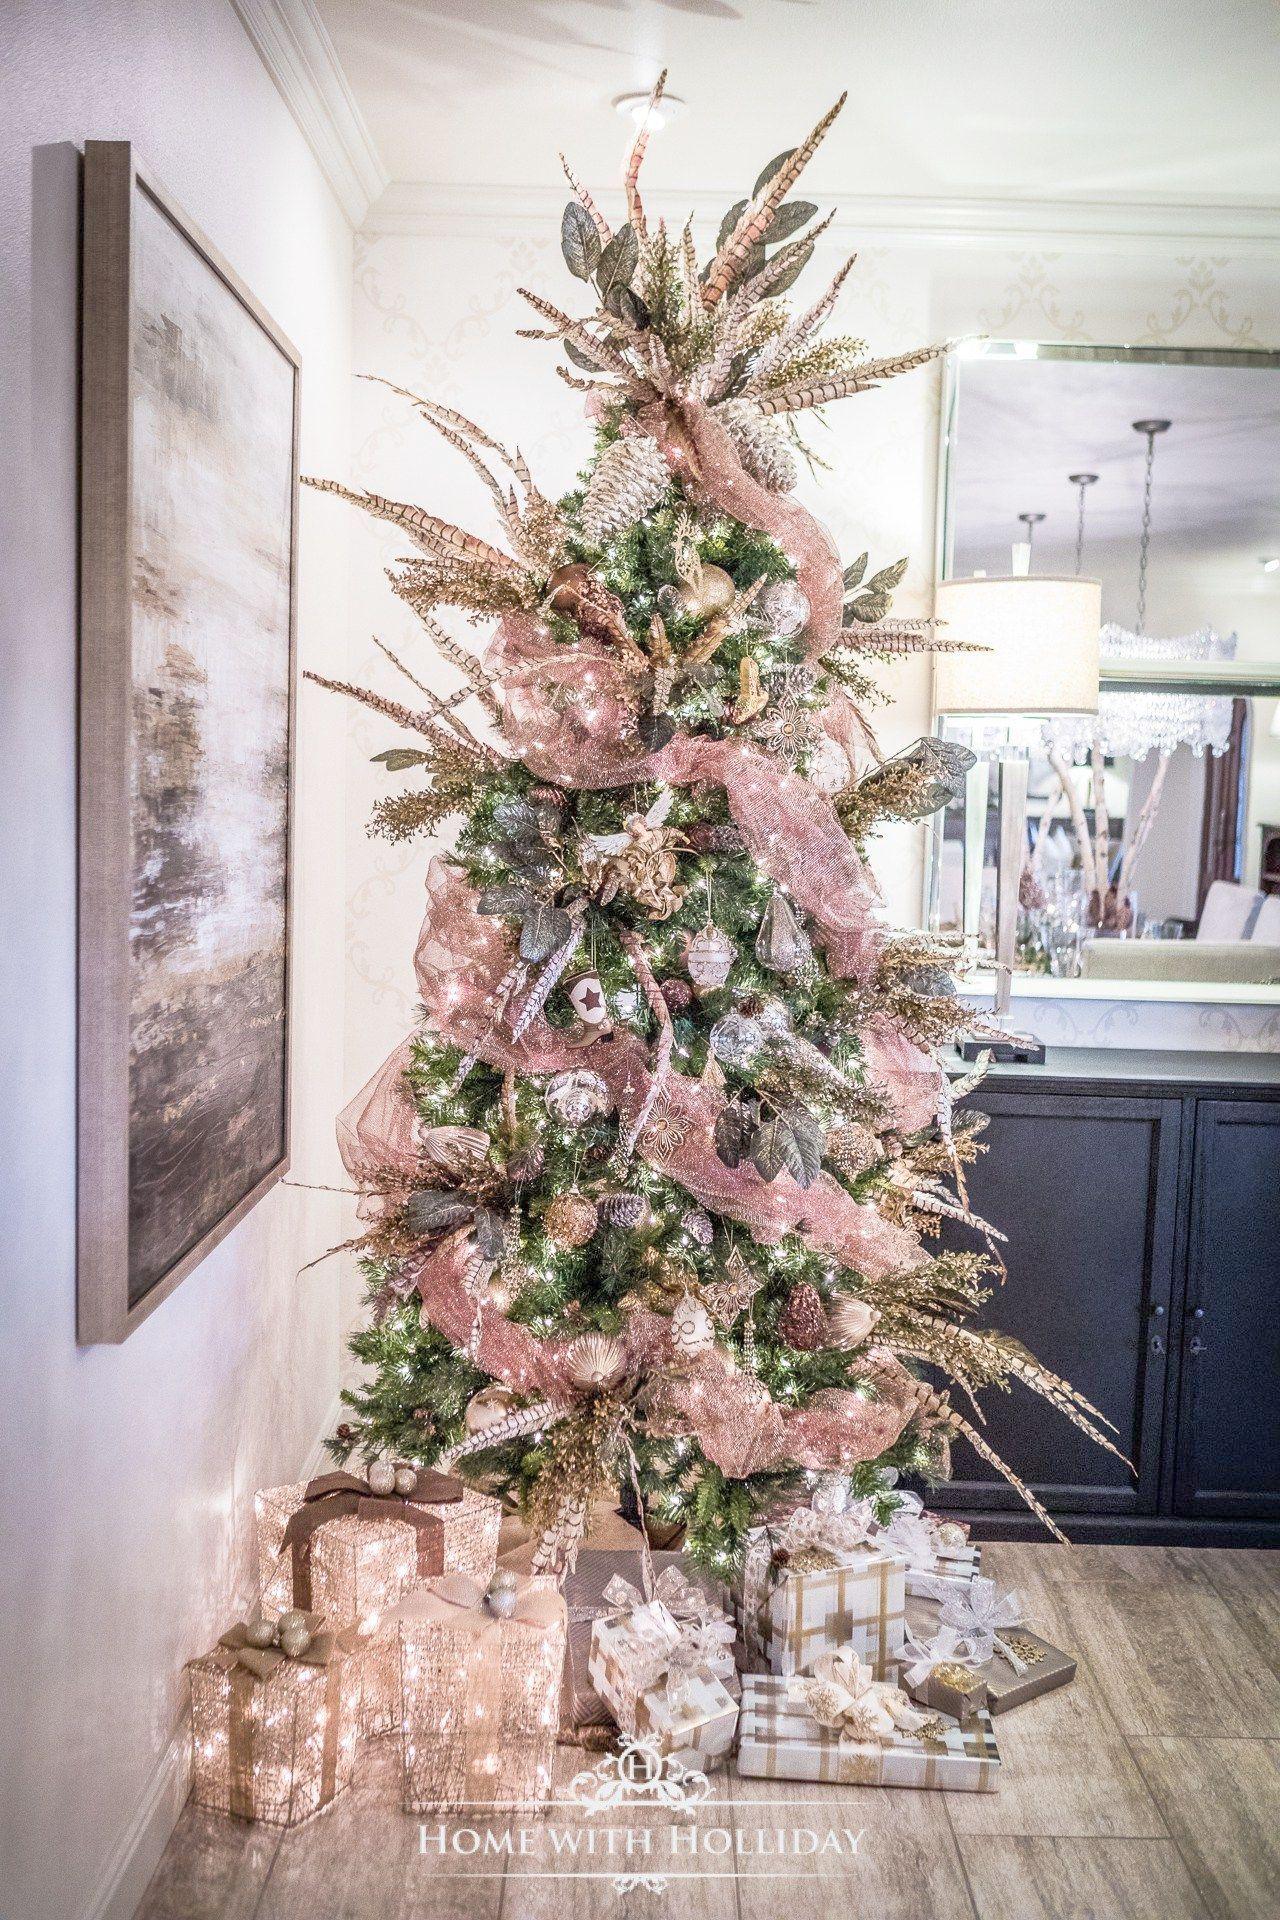 Christmas Tree Shop Hours Saturday despite Christmas